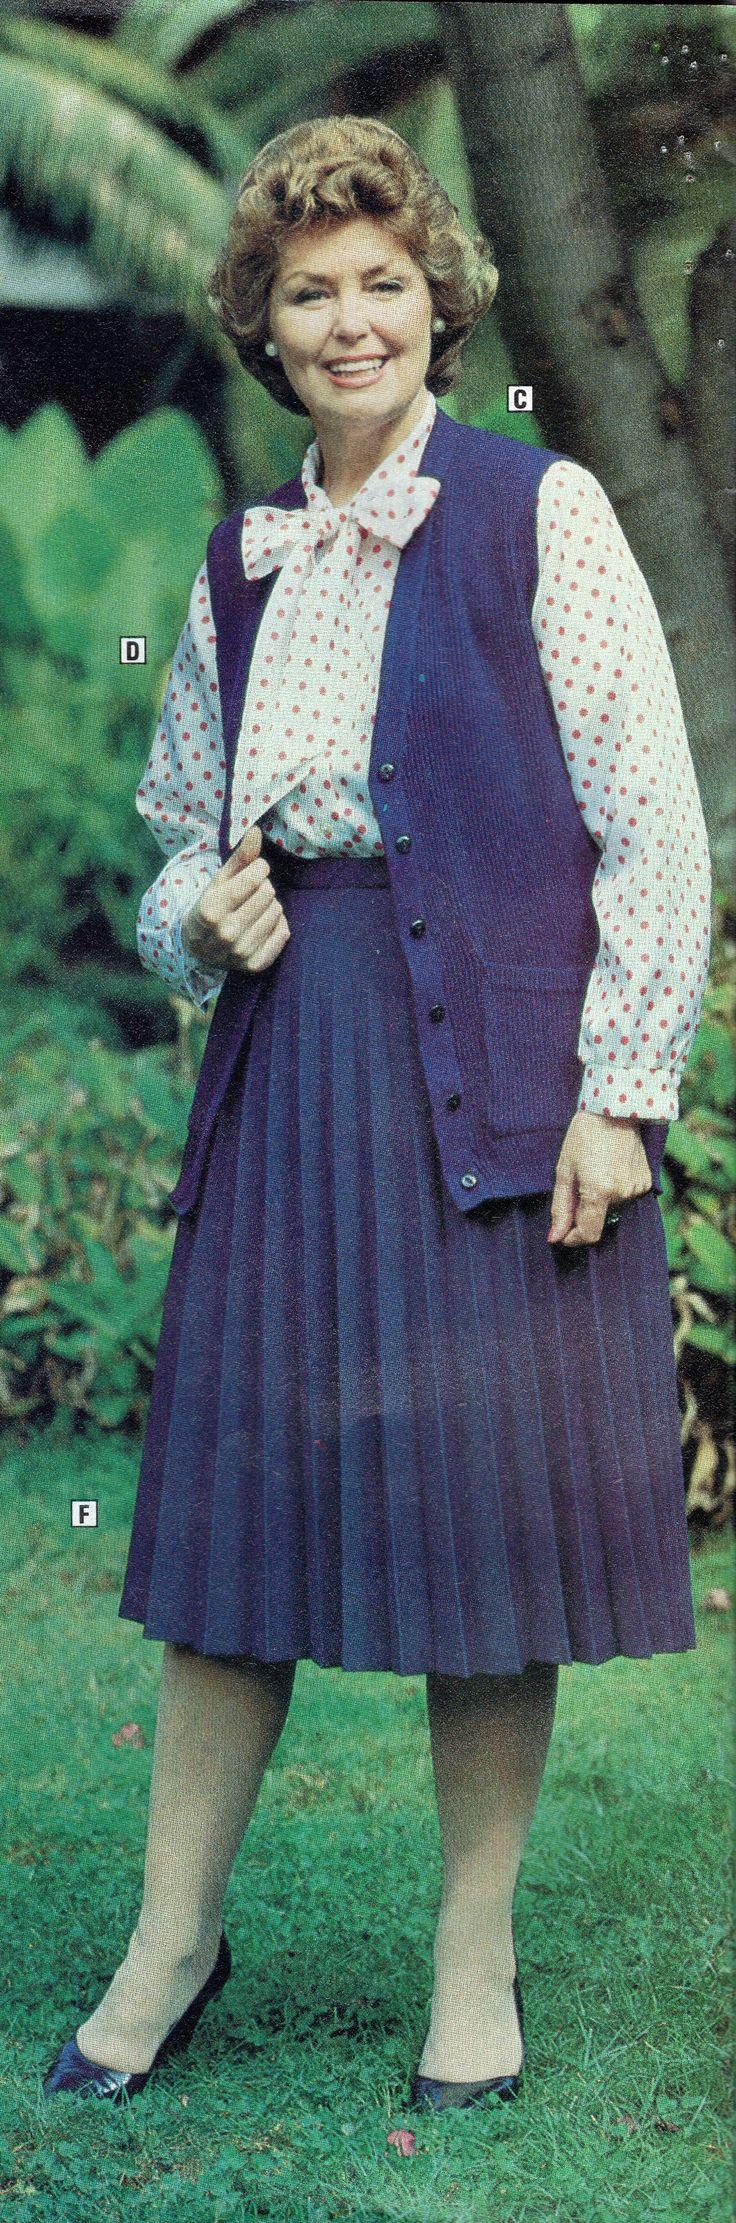 116 besten 1980 1989 bilder auf pinterest mode der 80er - 80er damenmode ...